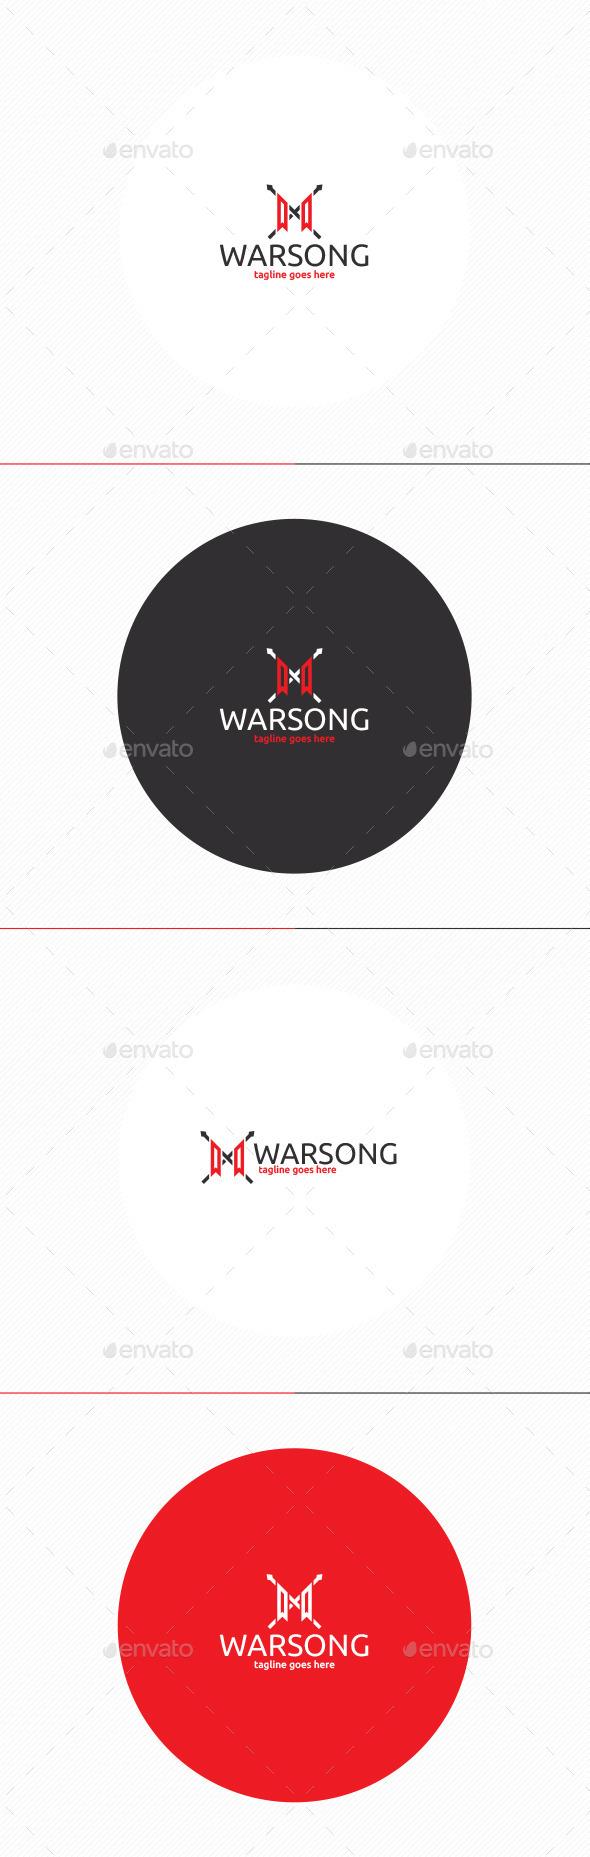 GraphicRiver Warsong Logo 11871521